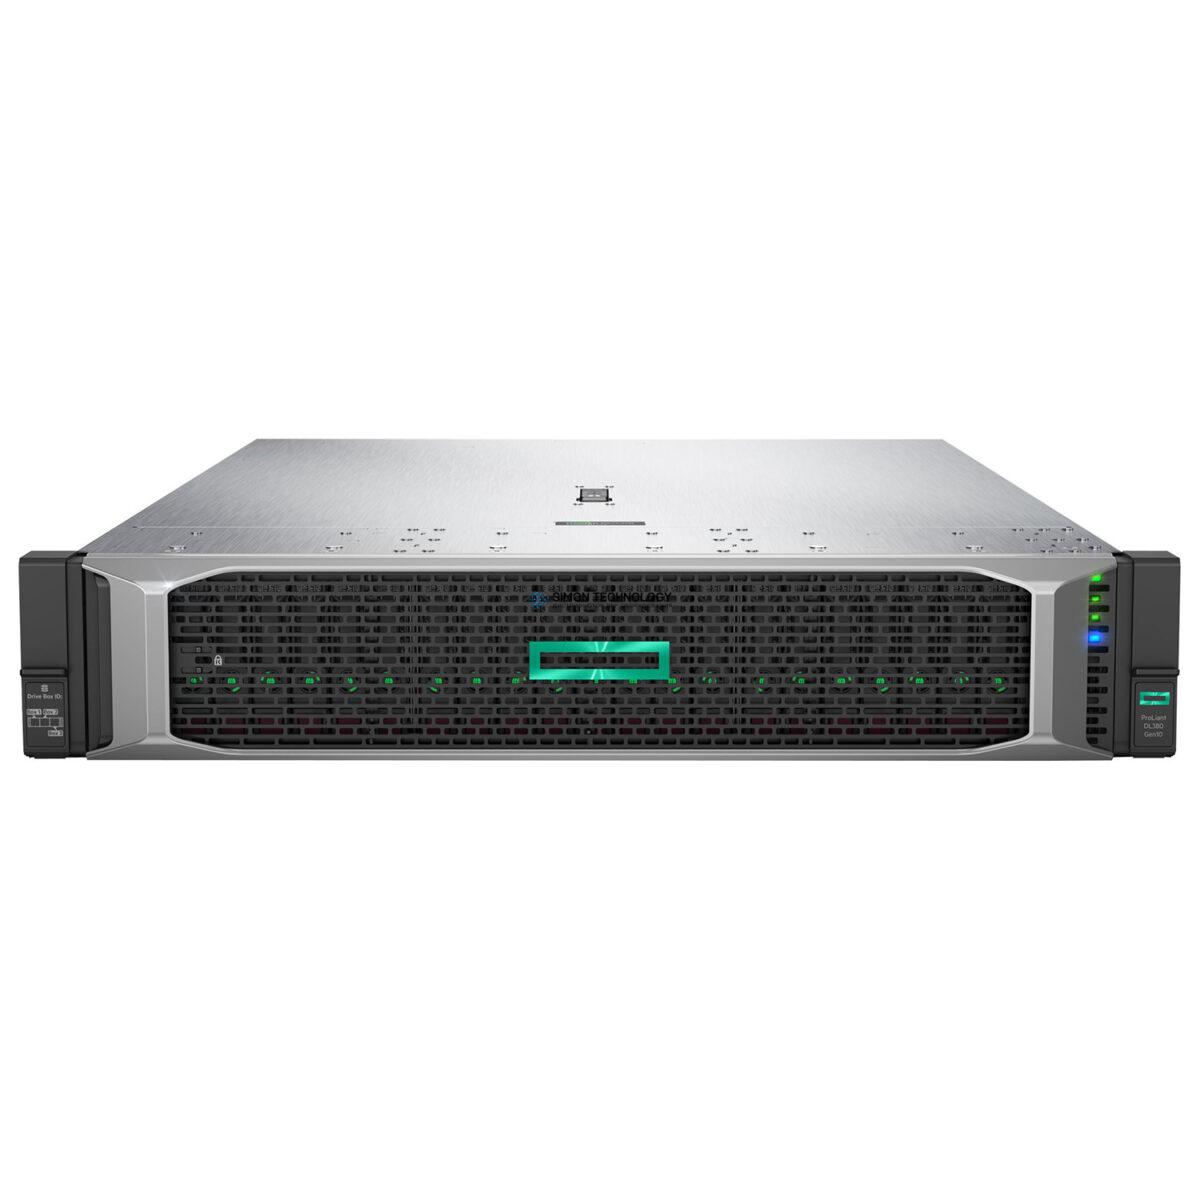 Сервер HPE DL380 GEN10 4210 1P 32G 8SFF HP NOHDD P408I NC (P20174-B21)